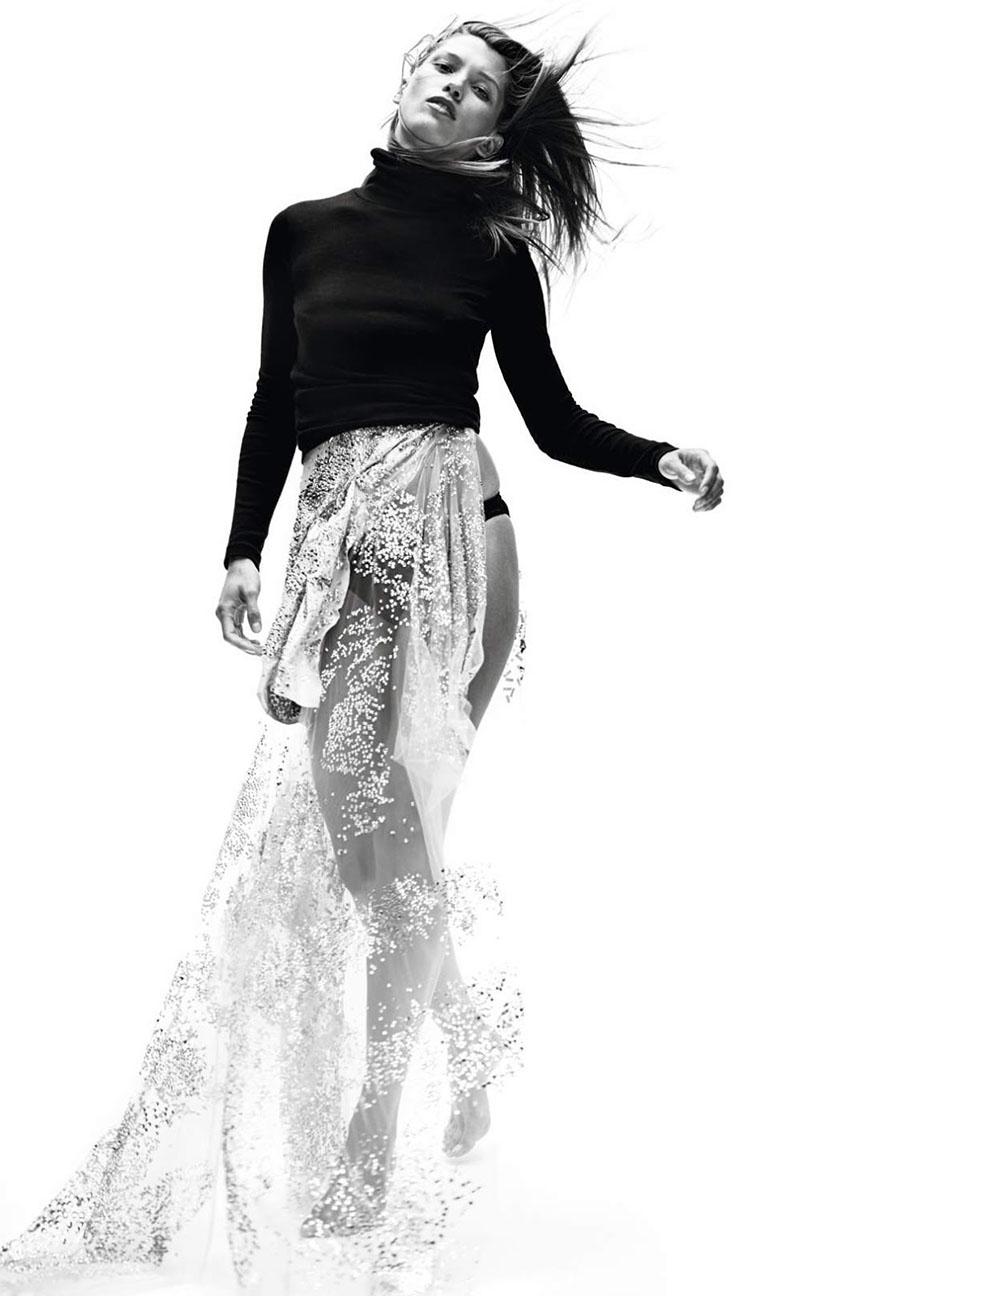 Hana Jirickova by Nathaniel Goldberg for Vogue Paris November 2018